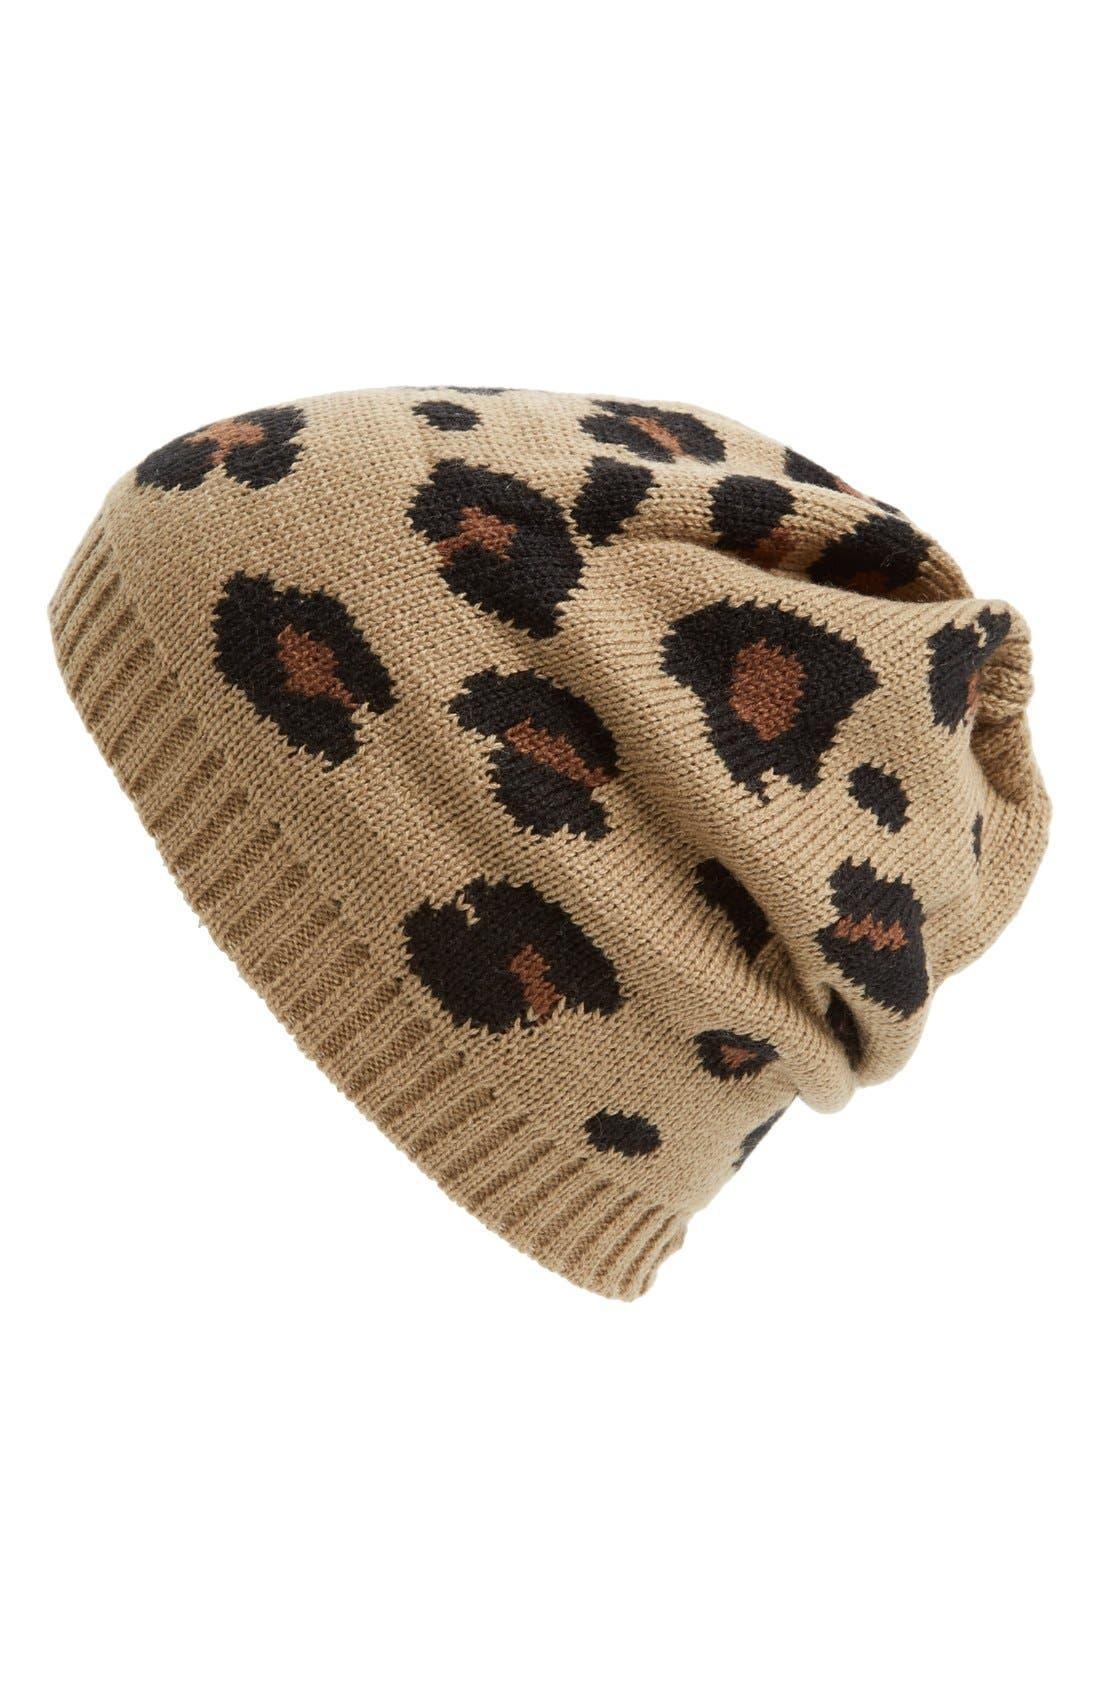 Main Image - Amici Accessories Slouchy Leopard Beanie (Juniors)